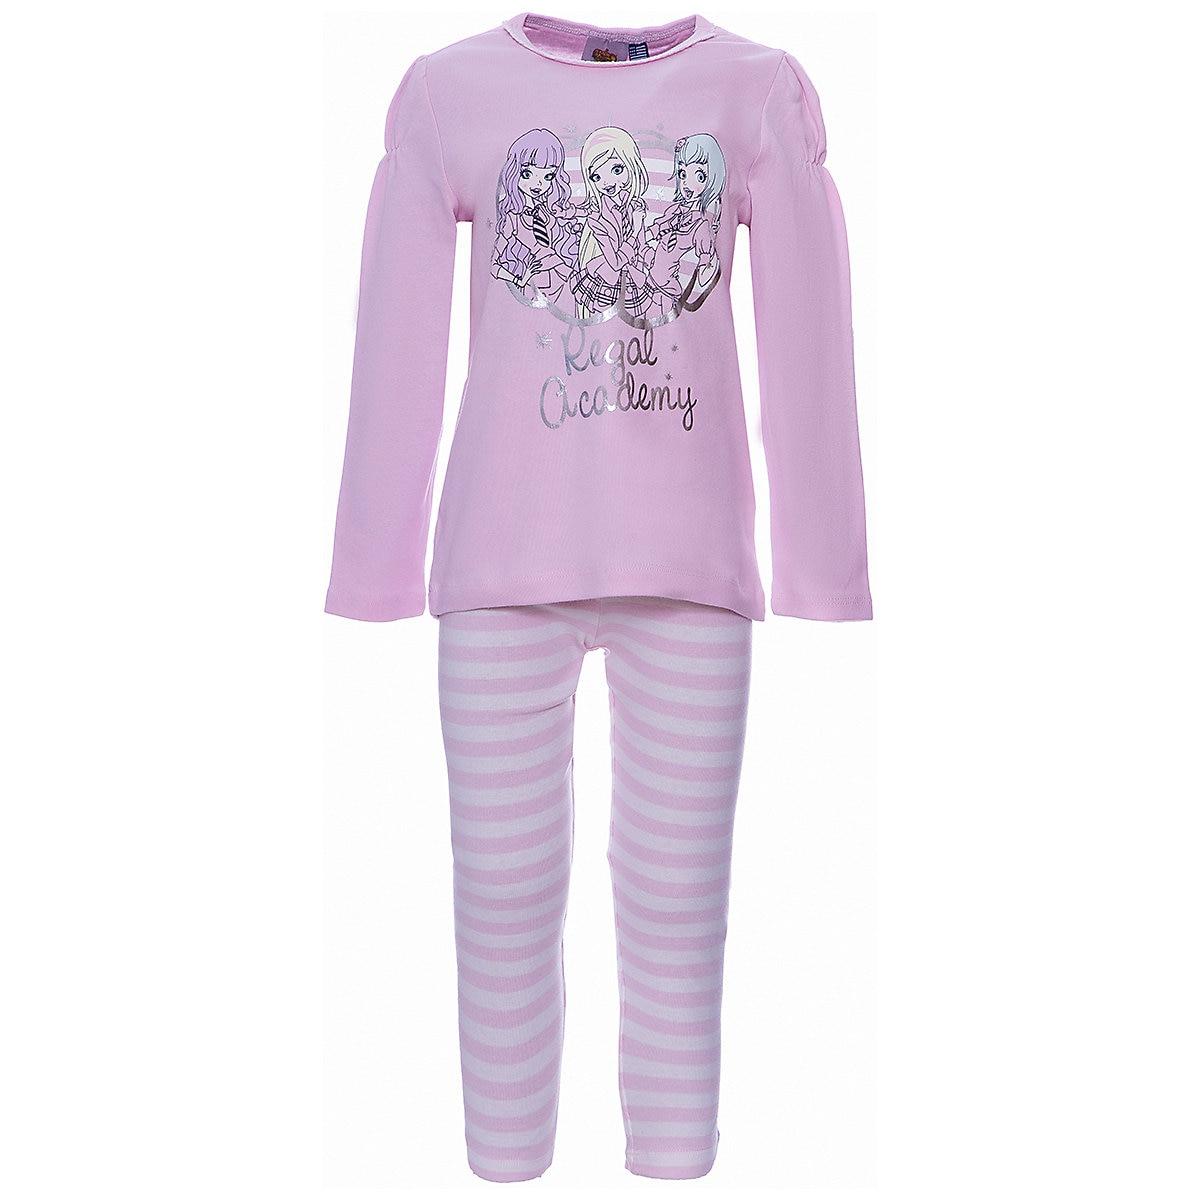 ORIGINAL MARINES Pajama Sets 9500904 Cotton Girls childrens clothing Sleepwear Robe parrot print cami pajama set with robe